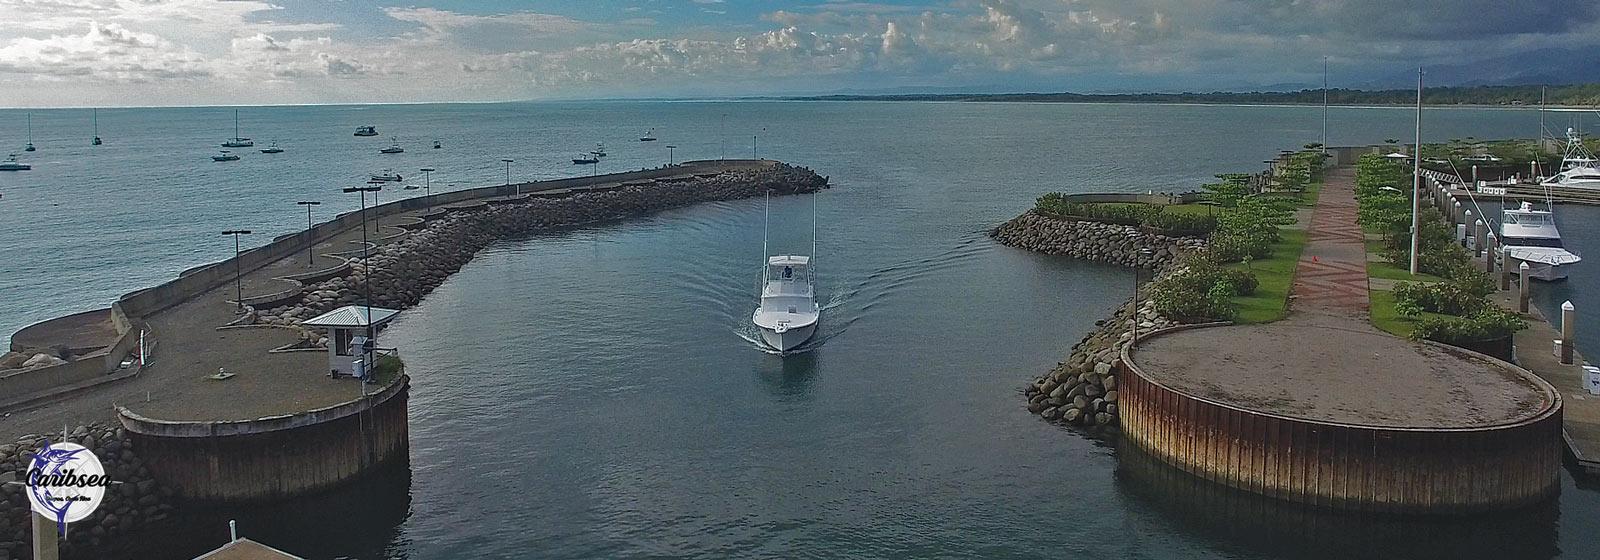 Caribsea Quepos sportfishing charter: entering marina